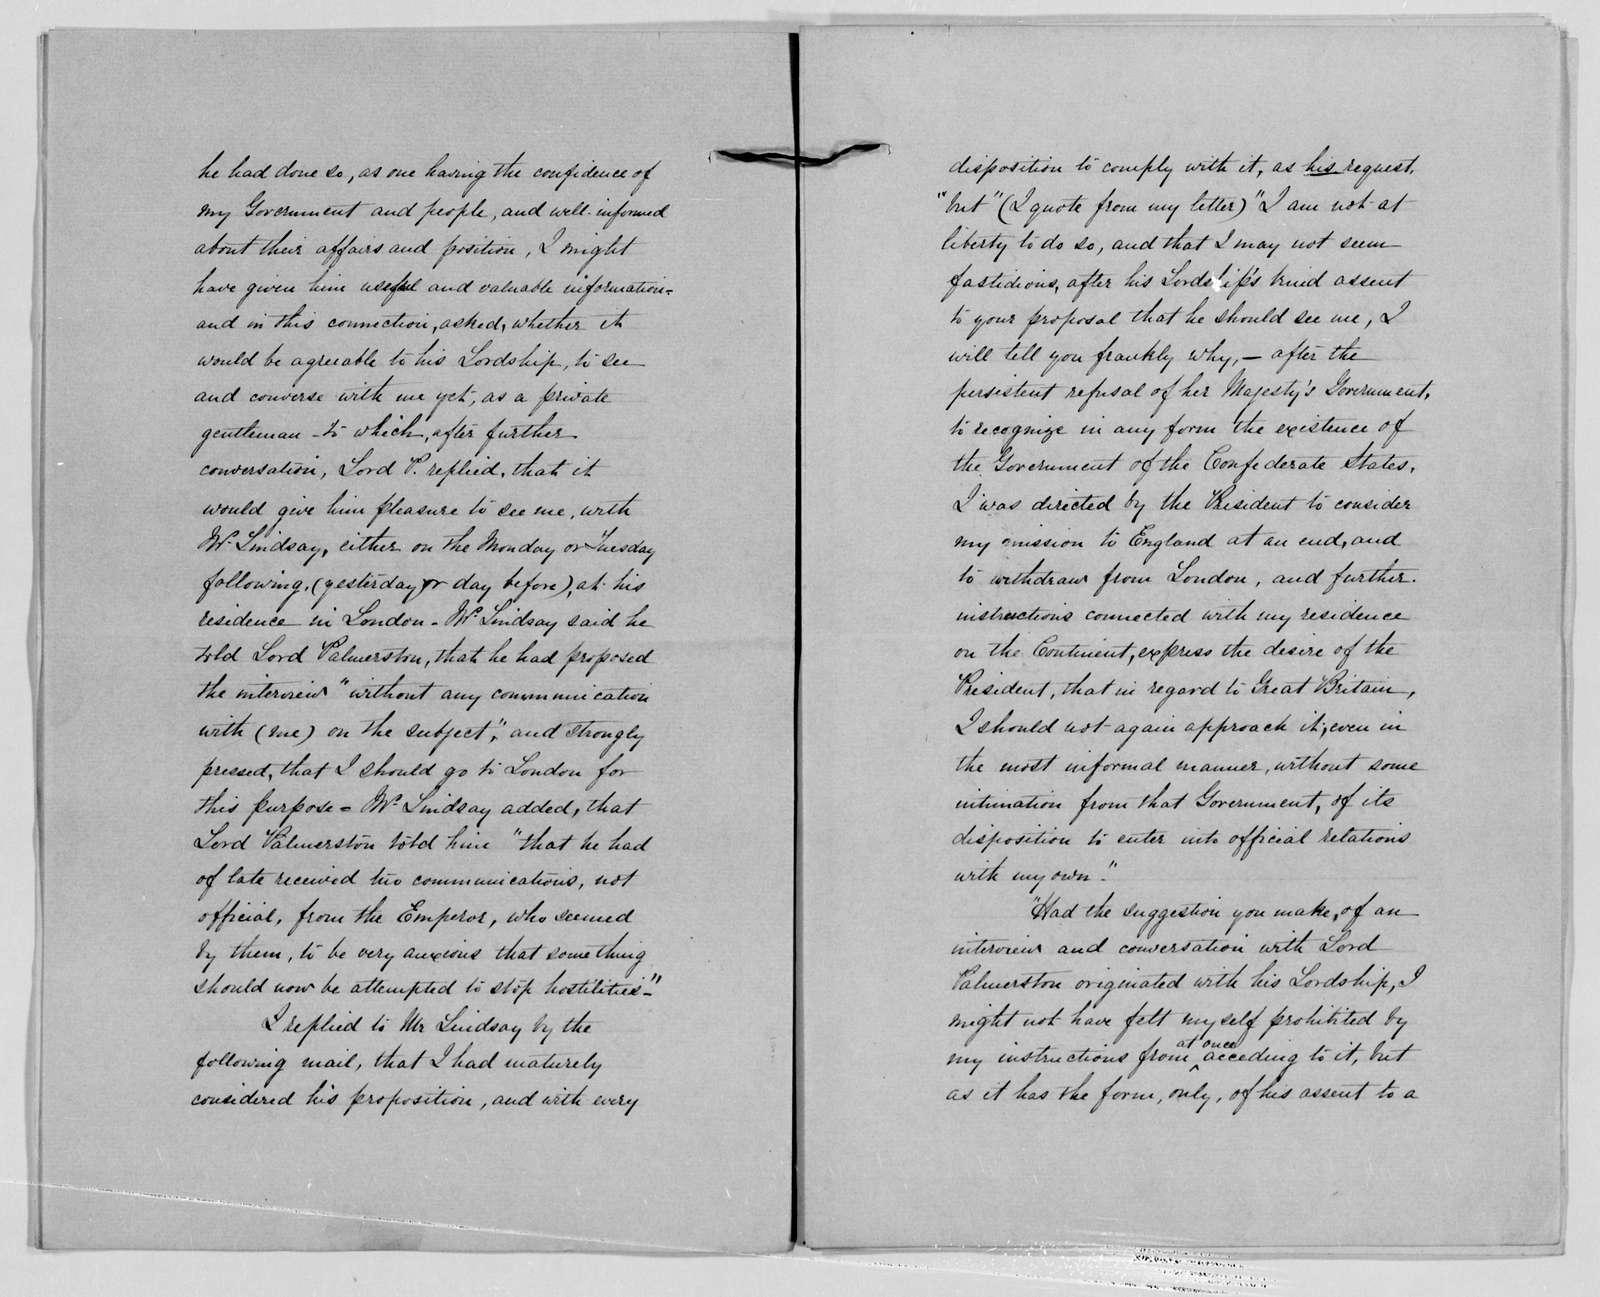 Confederate States of America records: Microfilm Reel 2